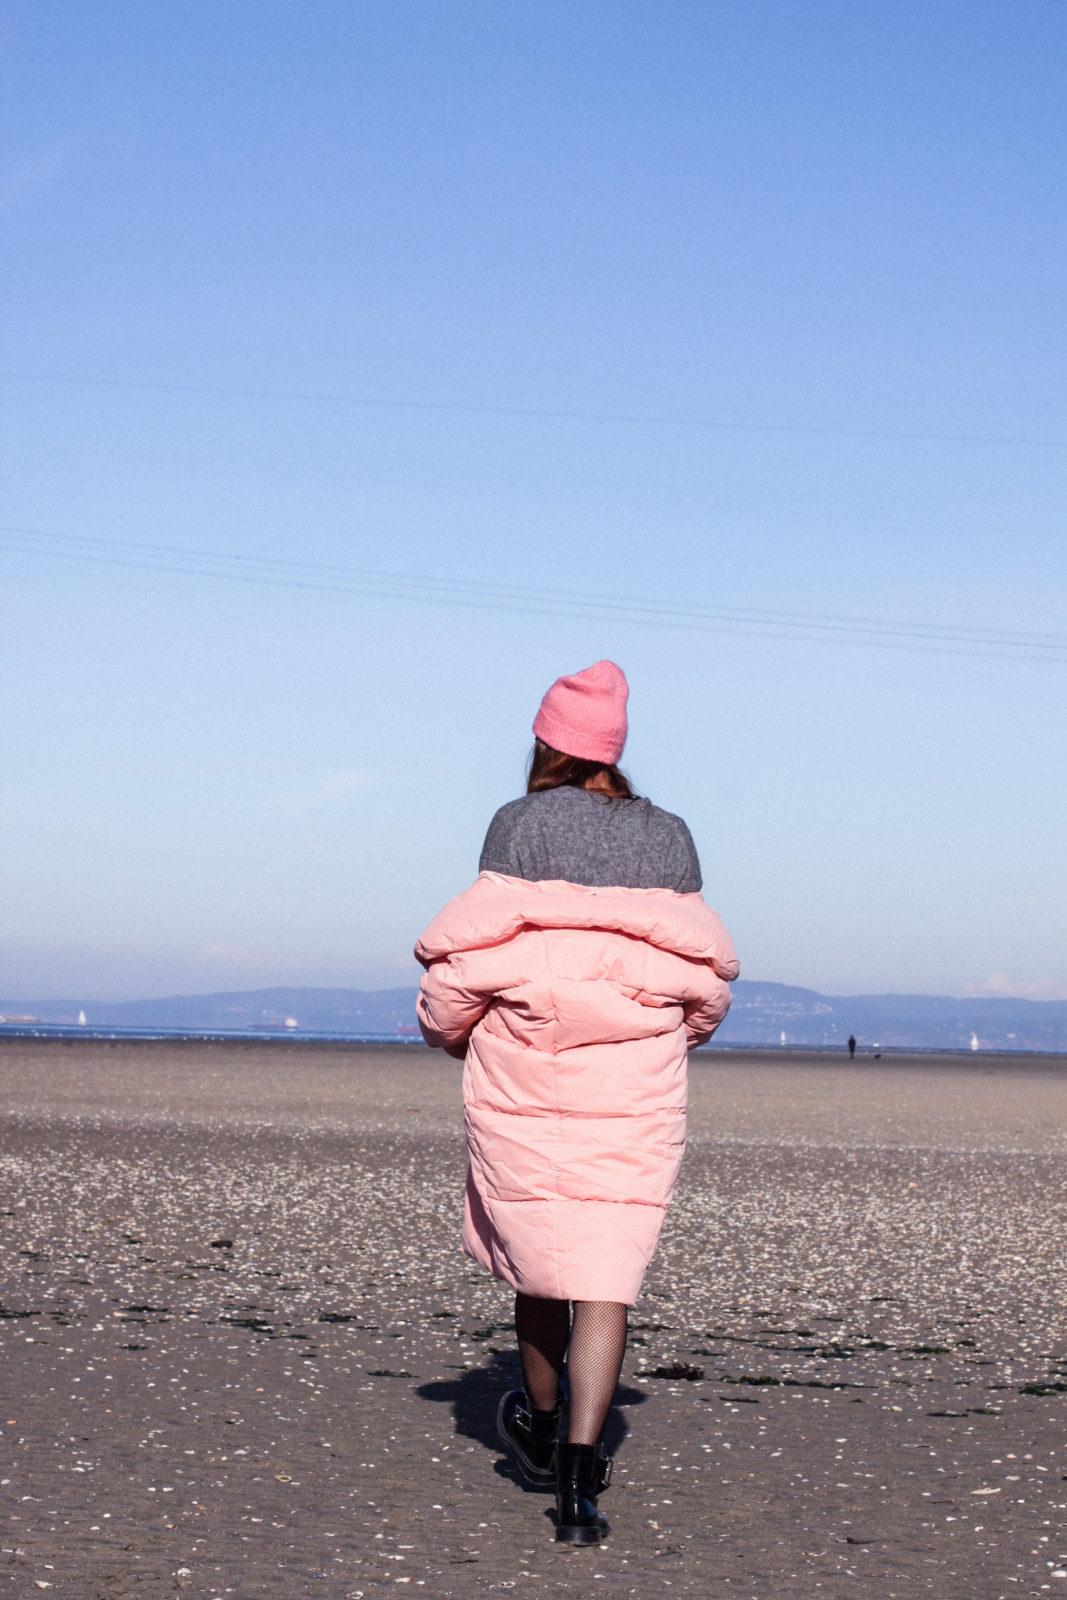 retailmenot-cupones-descuentos-asos-plumifero_rosa-monki-puffer_coat-gorro-beanie-medias_de_rejilla-look-outfit-tendencias-fall-2016-street_style-donkeycool-43